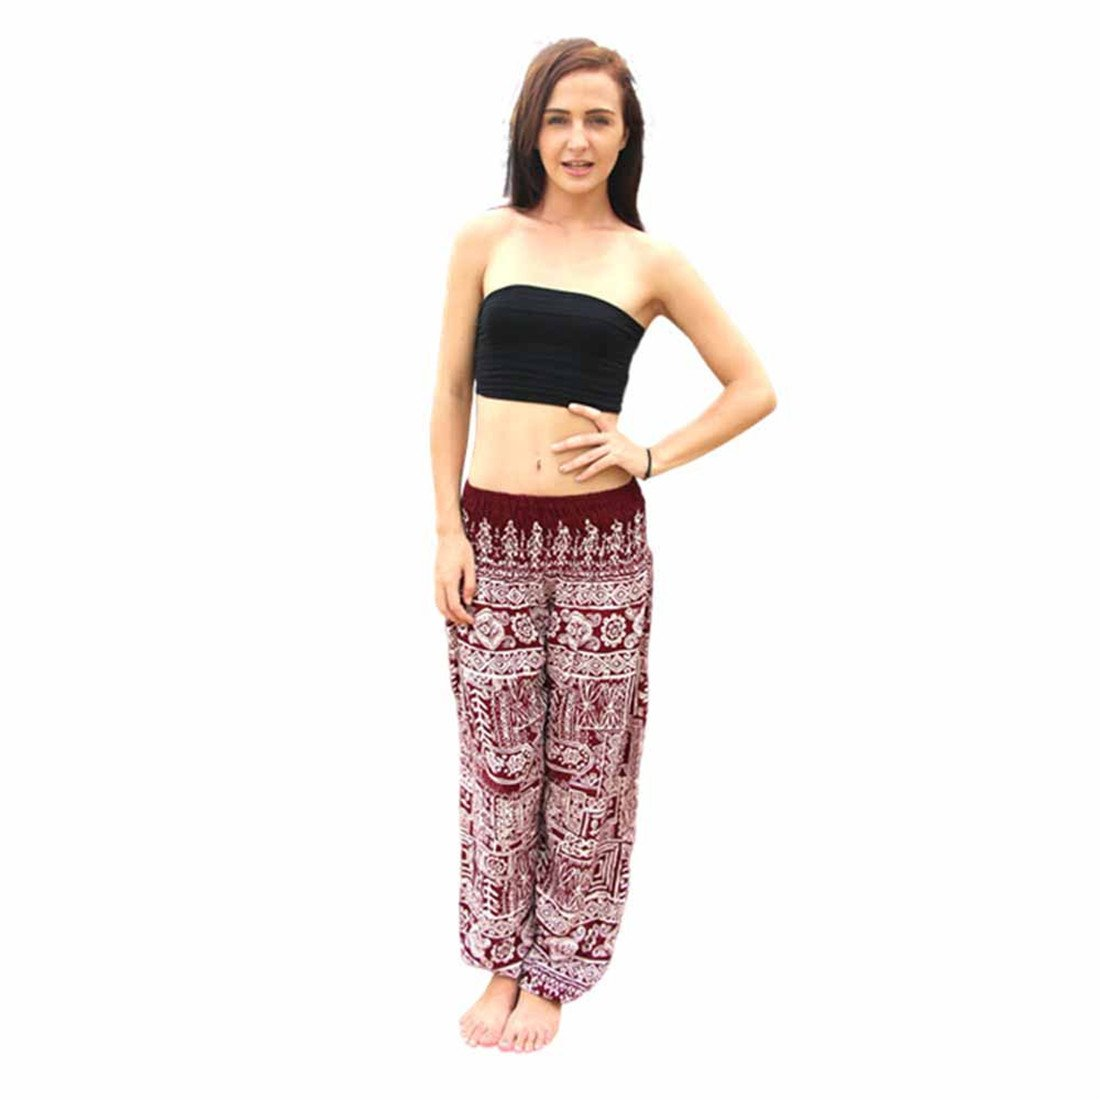 47893dd117 Womens Yoga Pants,YKA,Men Thai Harem Trousers Boho Festival Hippy Smock  High Waist Pants for Ladies - Purple - Free Size: Amazon.co.uk: Clothing